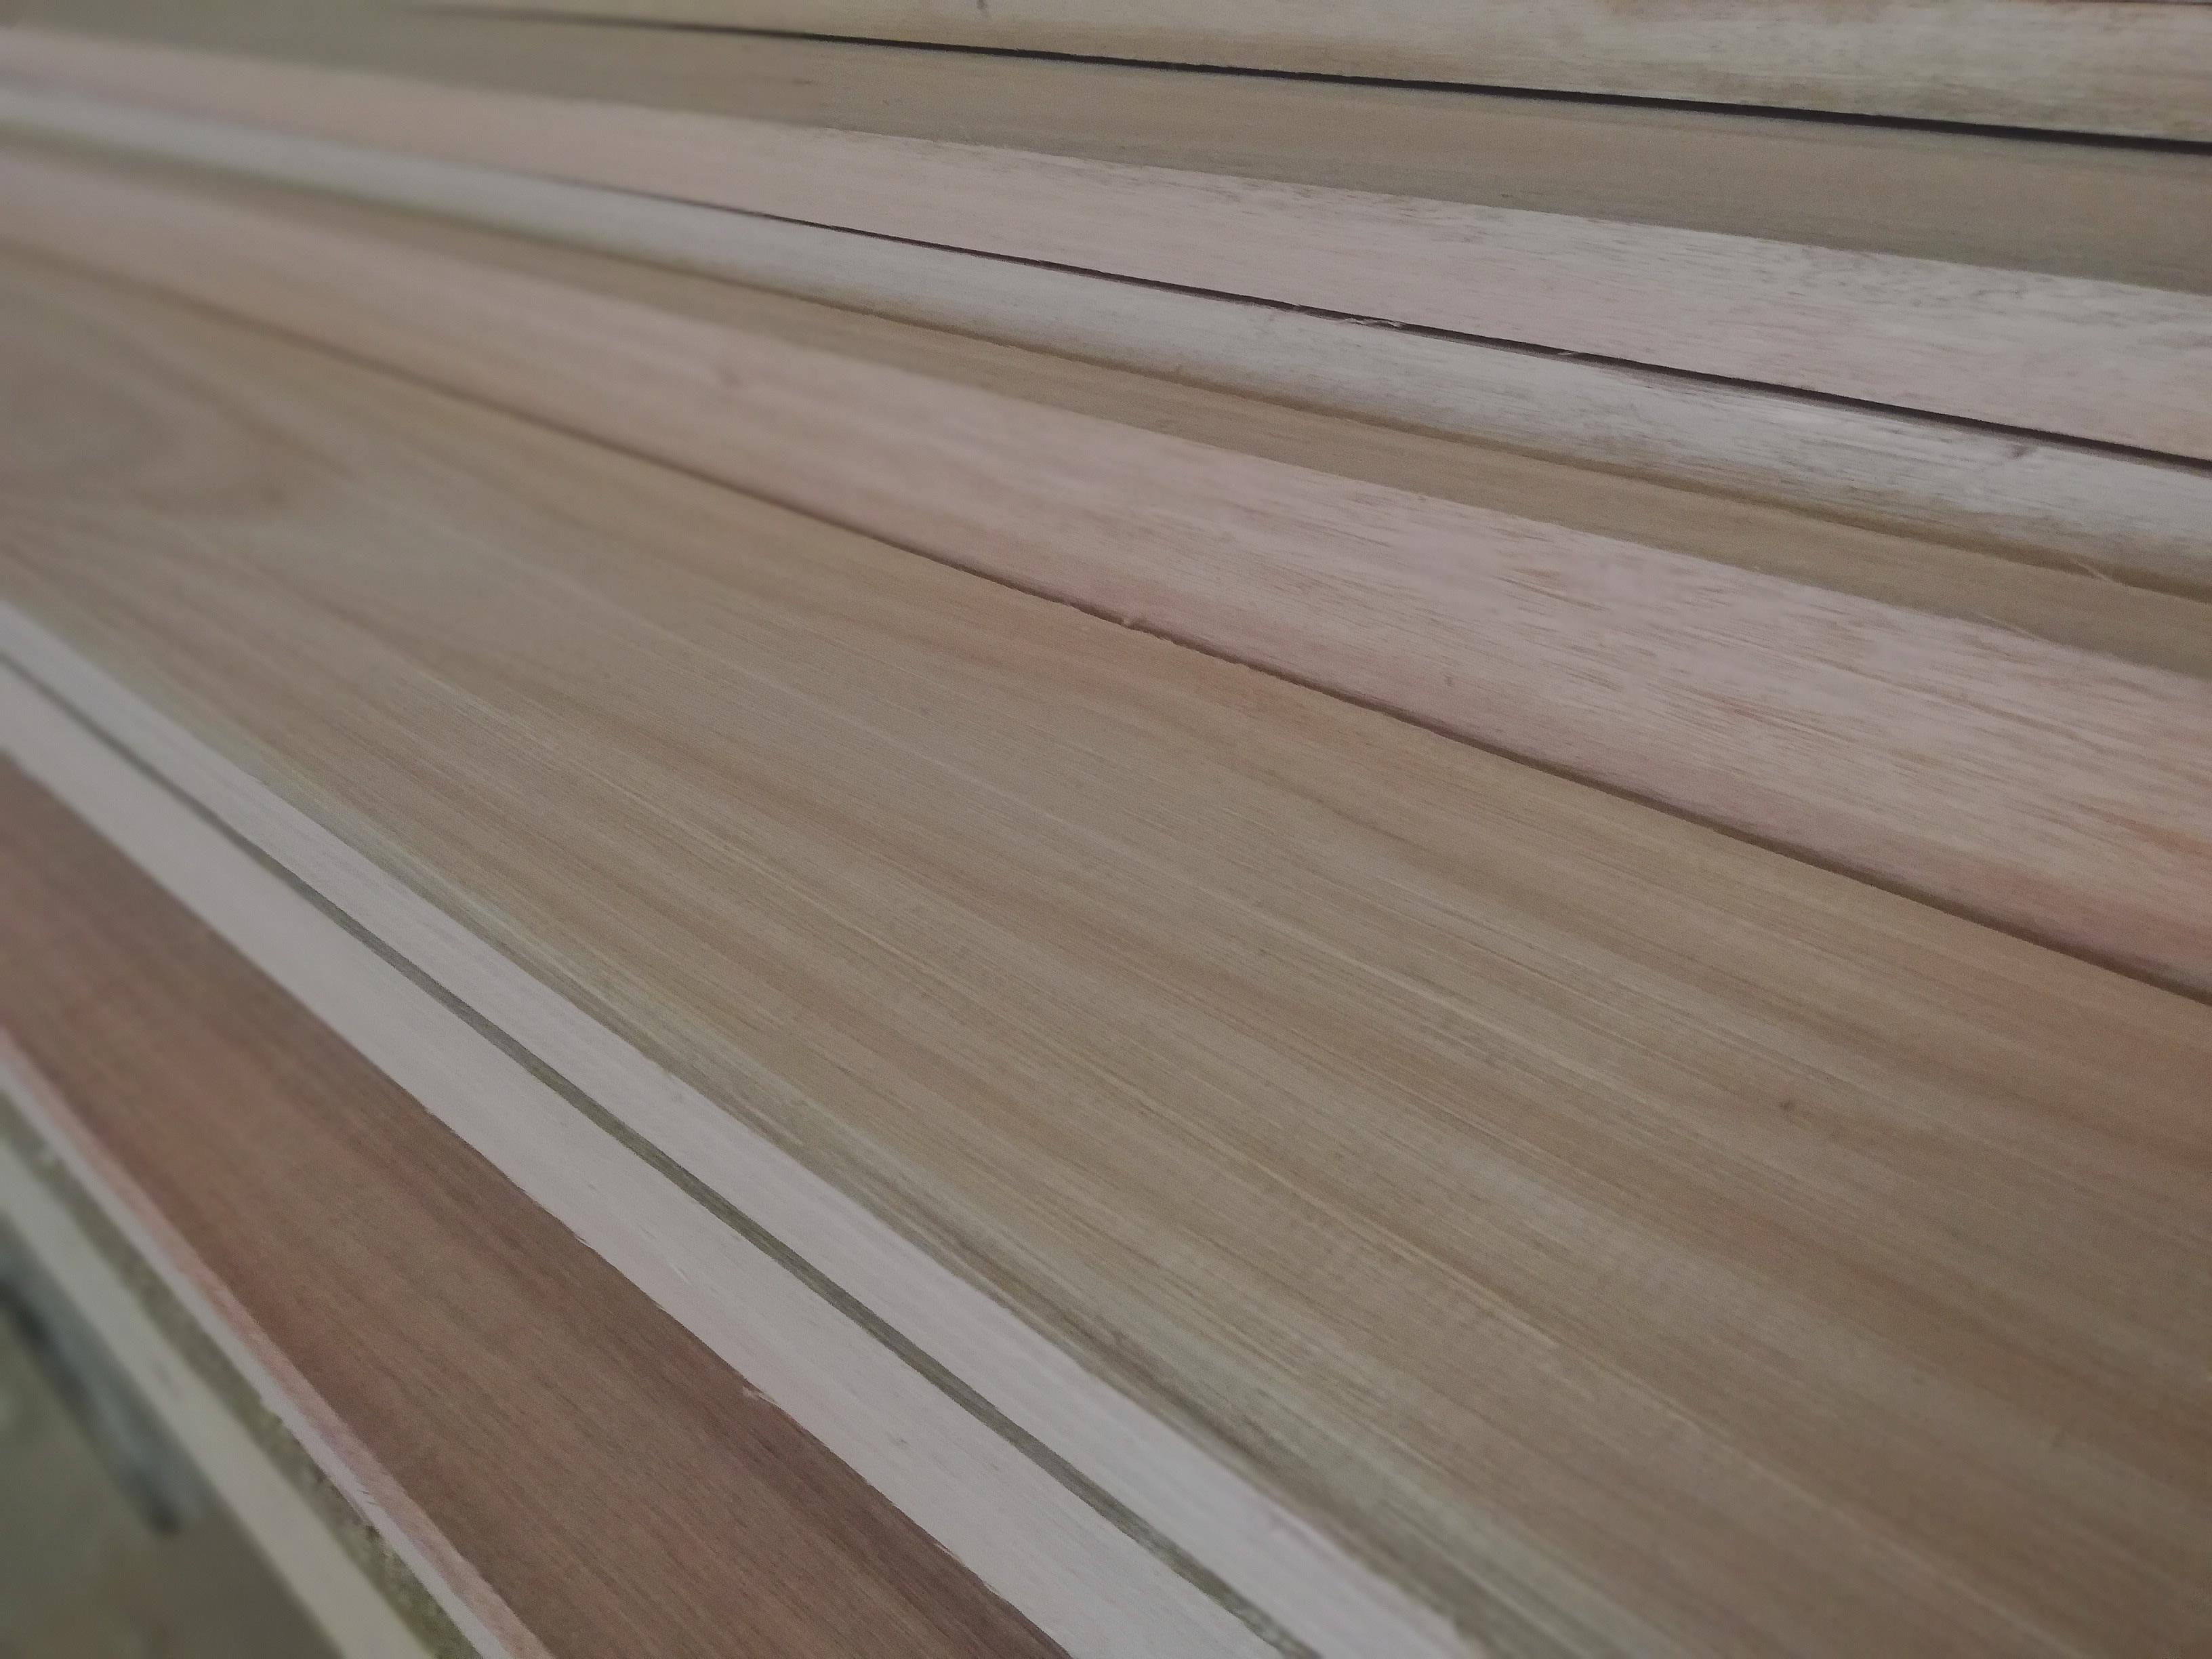 Saligna Wood. A-Grade Wood. Furniture Grade Wood. Hard Wood in the Lowveld. WoodTrade